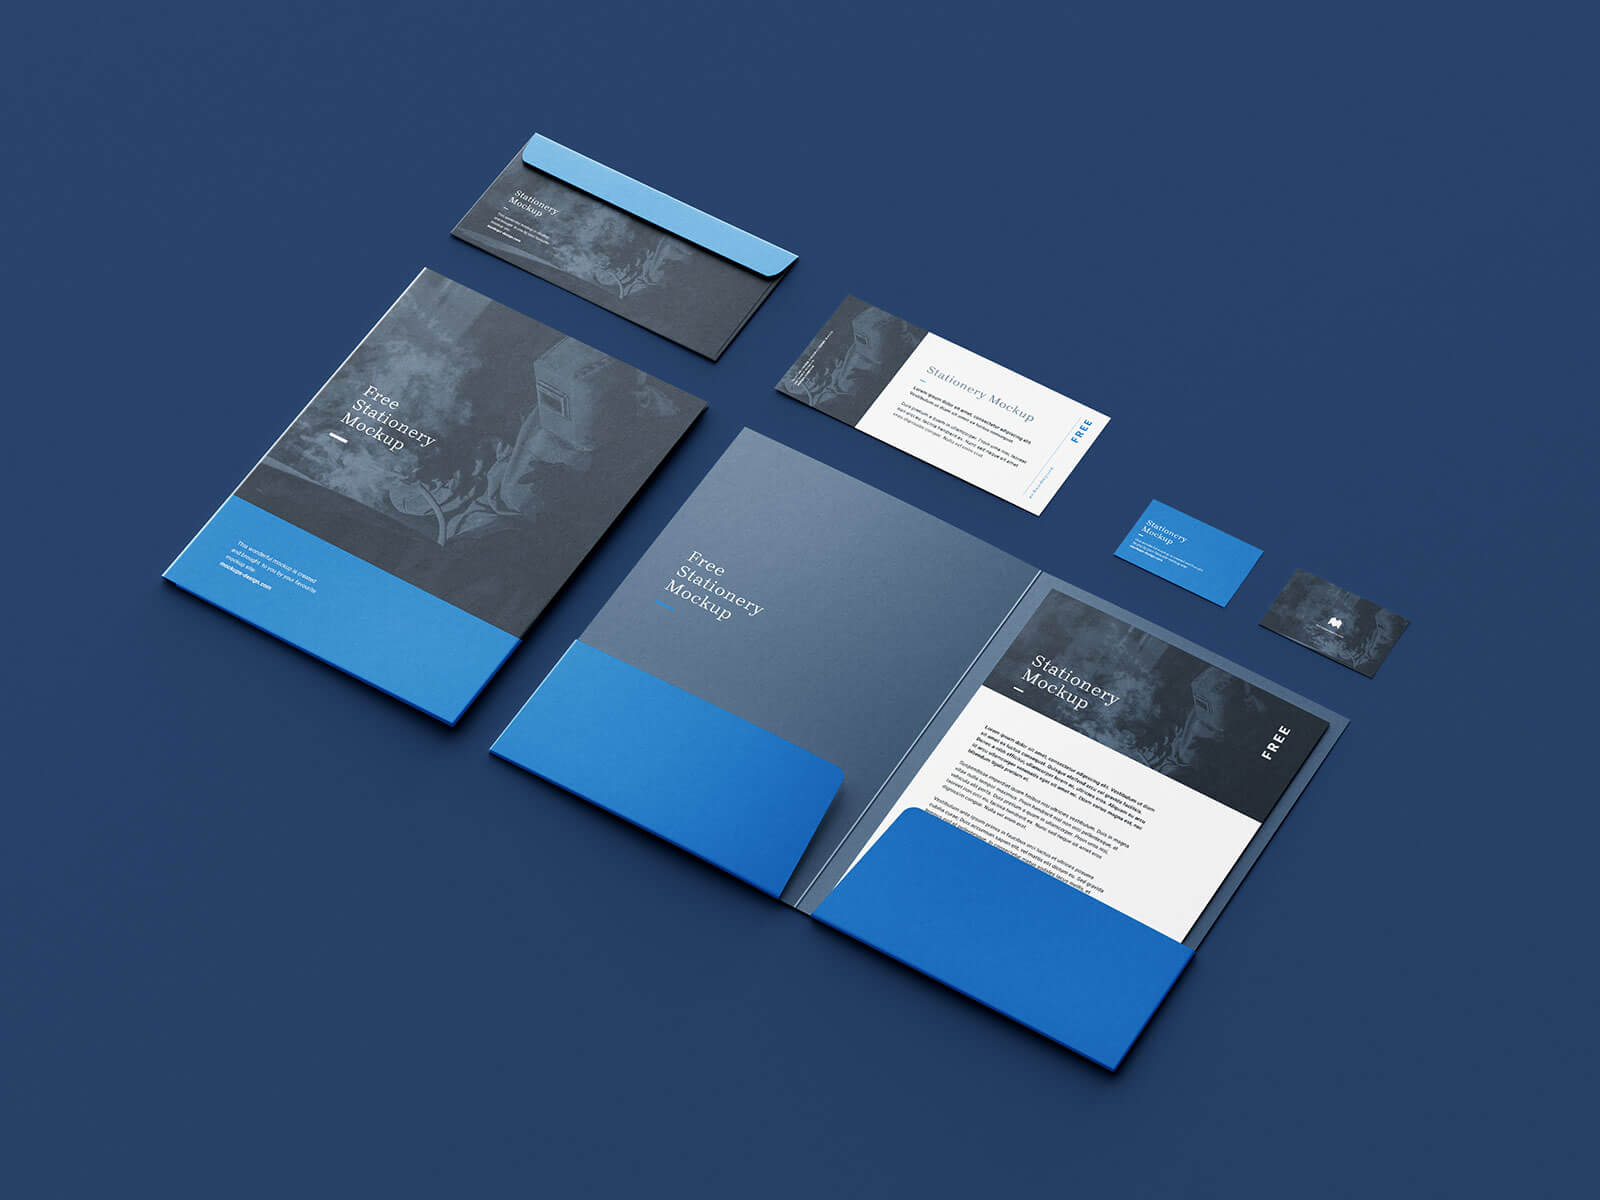 Free Premium Stationery Mockup PSD Set (6 Renders)